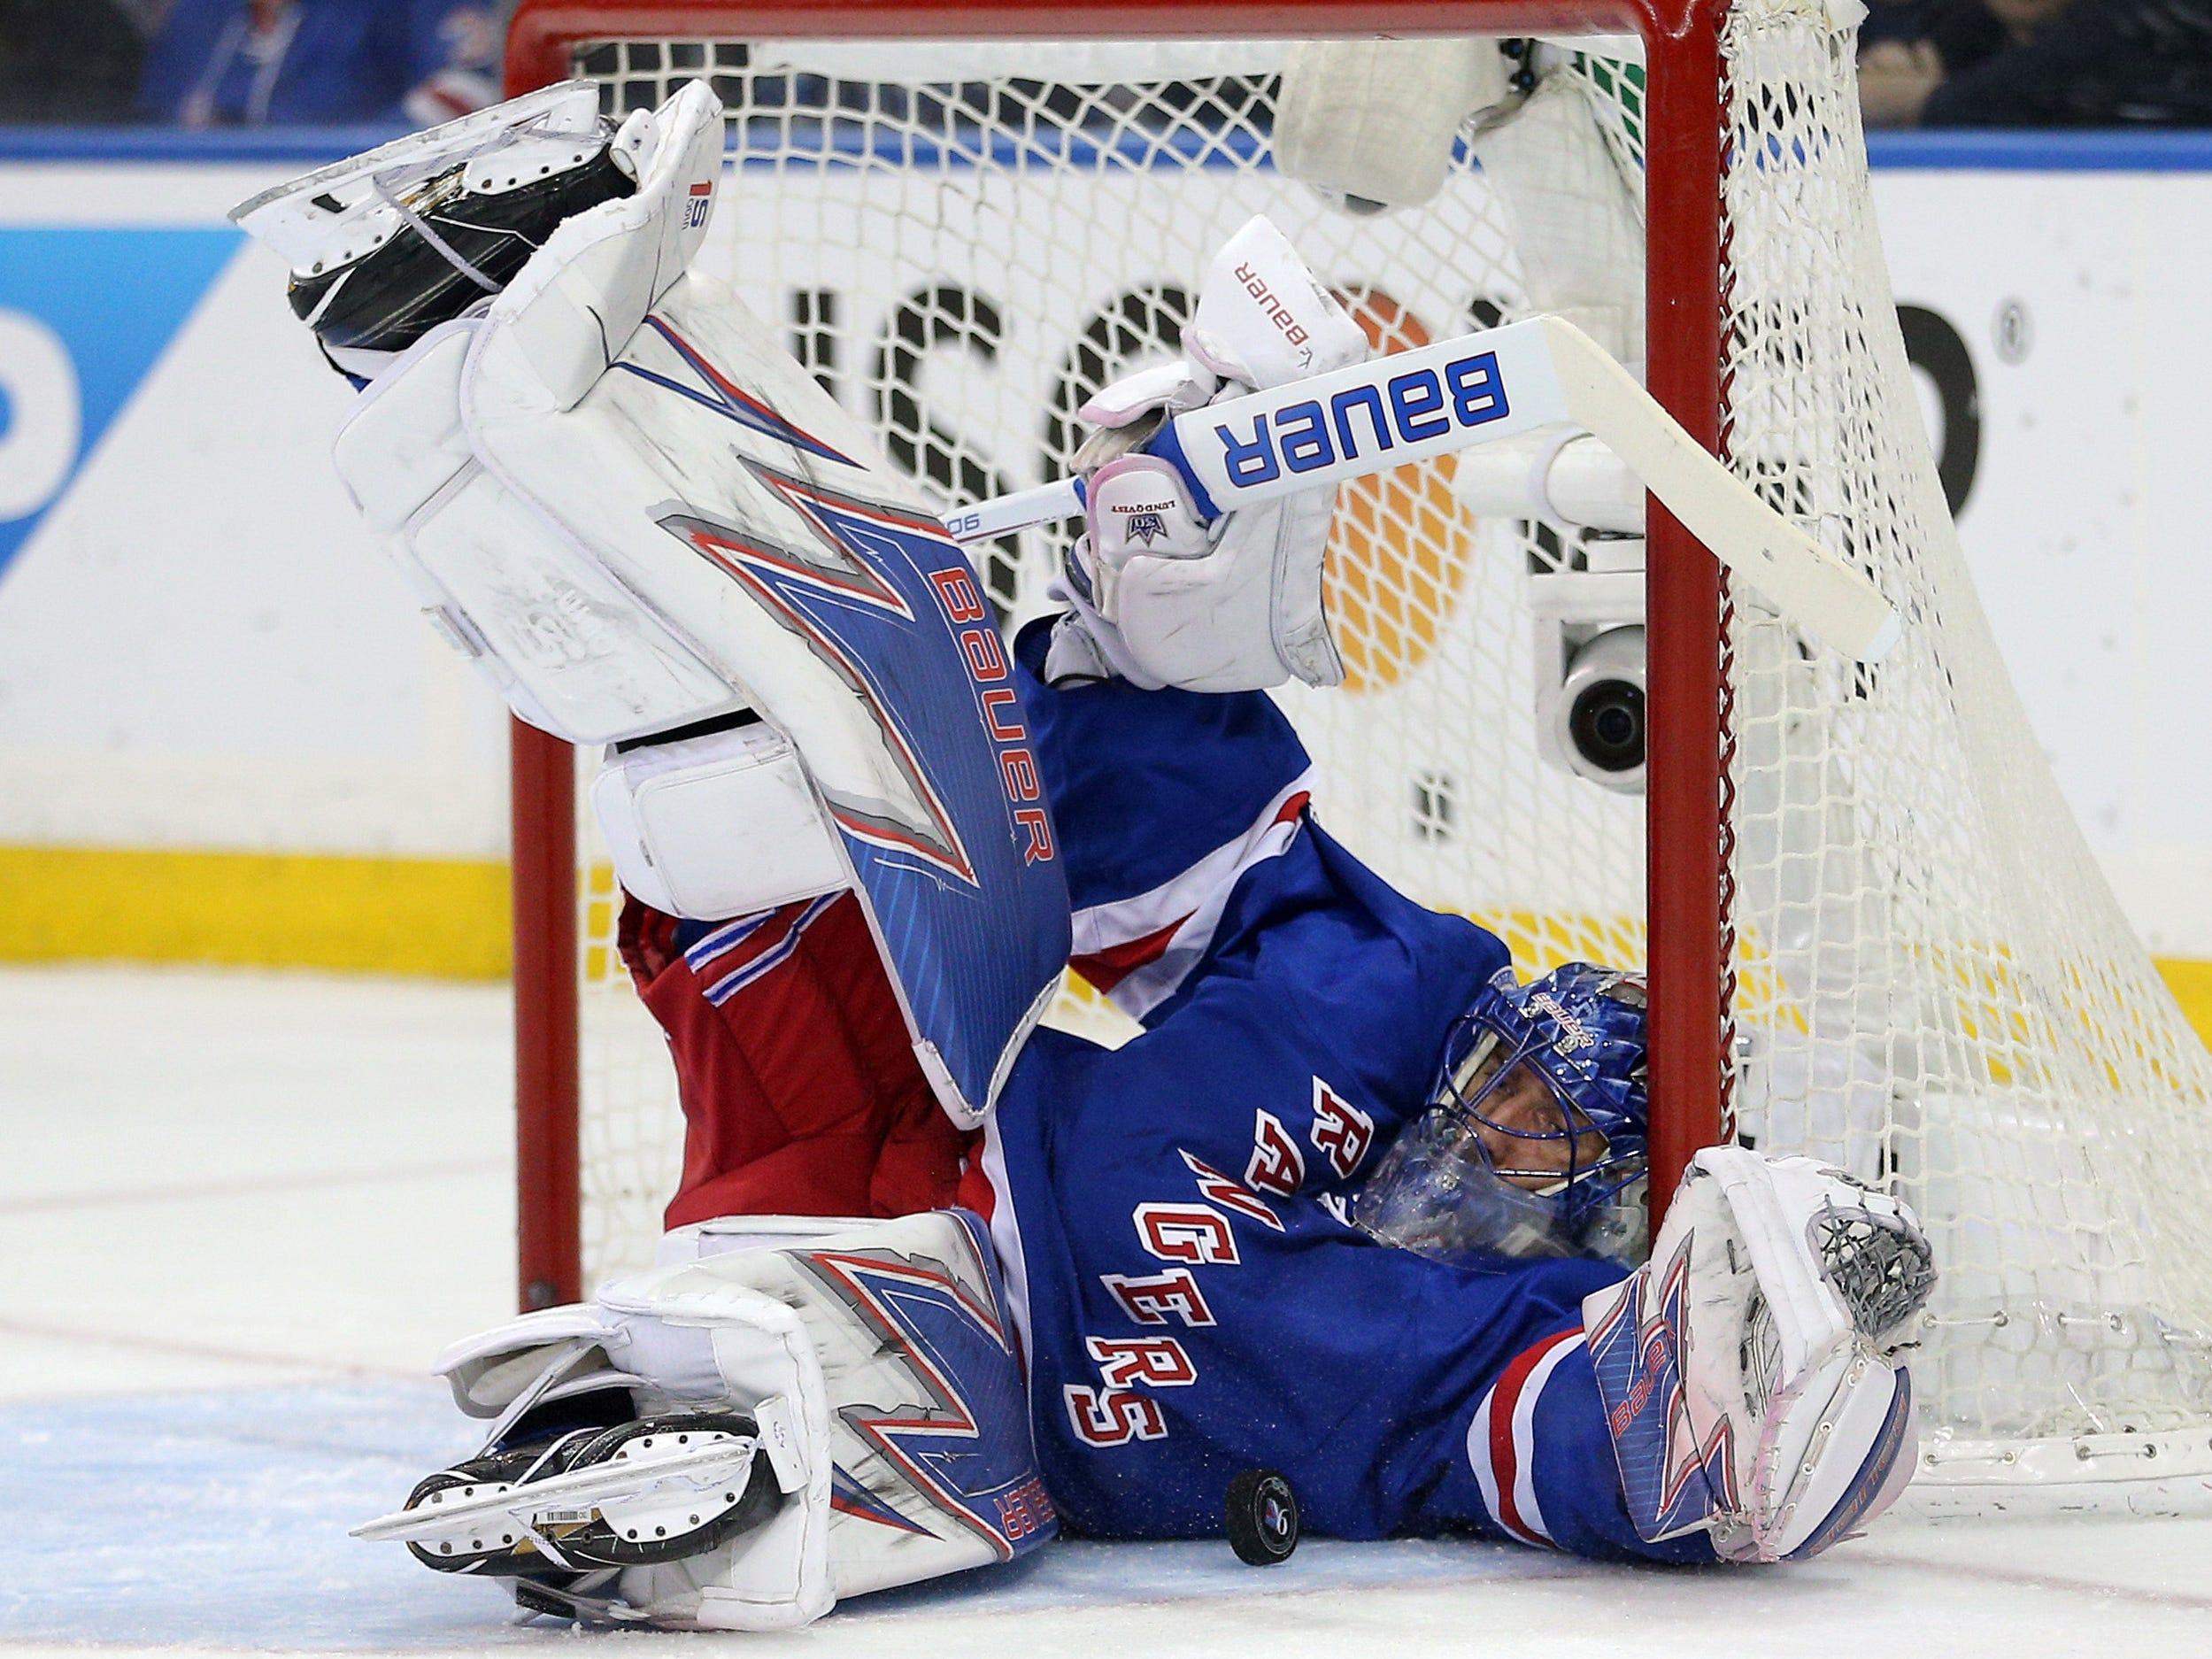 New York Rangers goalie Henrik Lundqvist had a .915 save percentage last season.